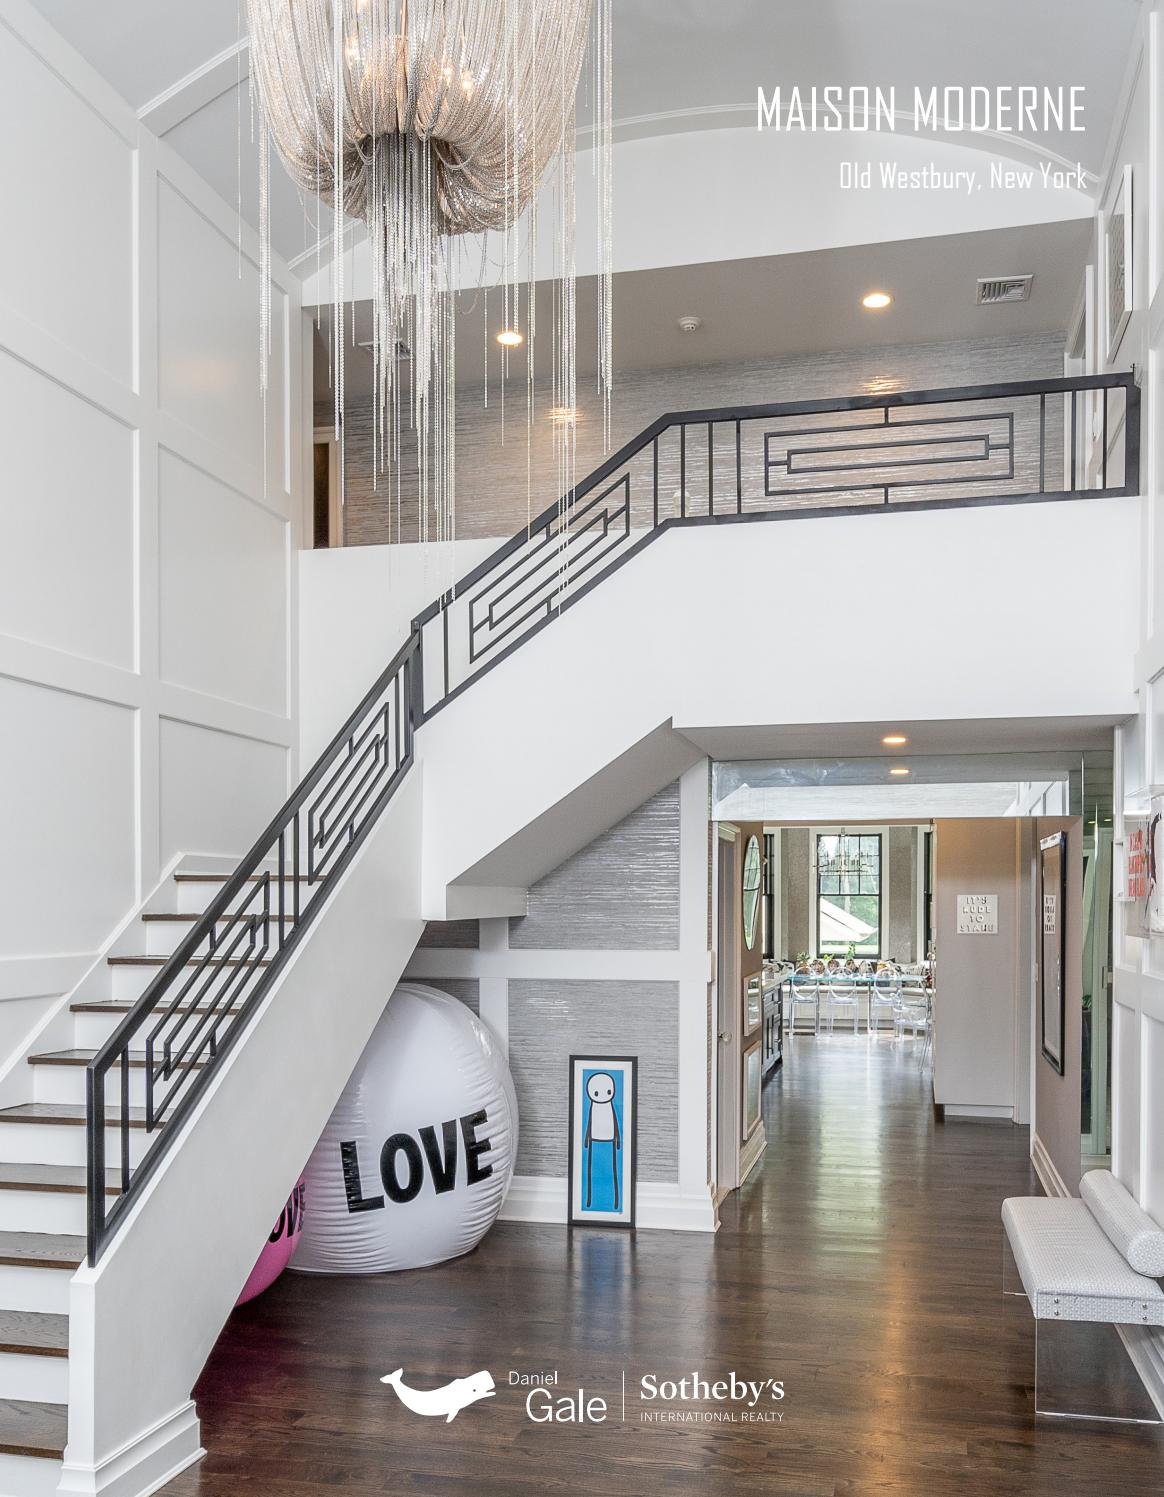 Image De Maison Moderne maison moderne - old westbury, new yorkdaniel gale